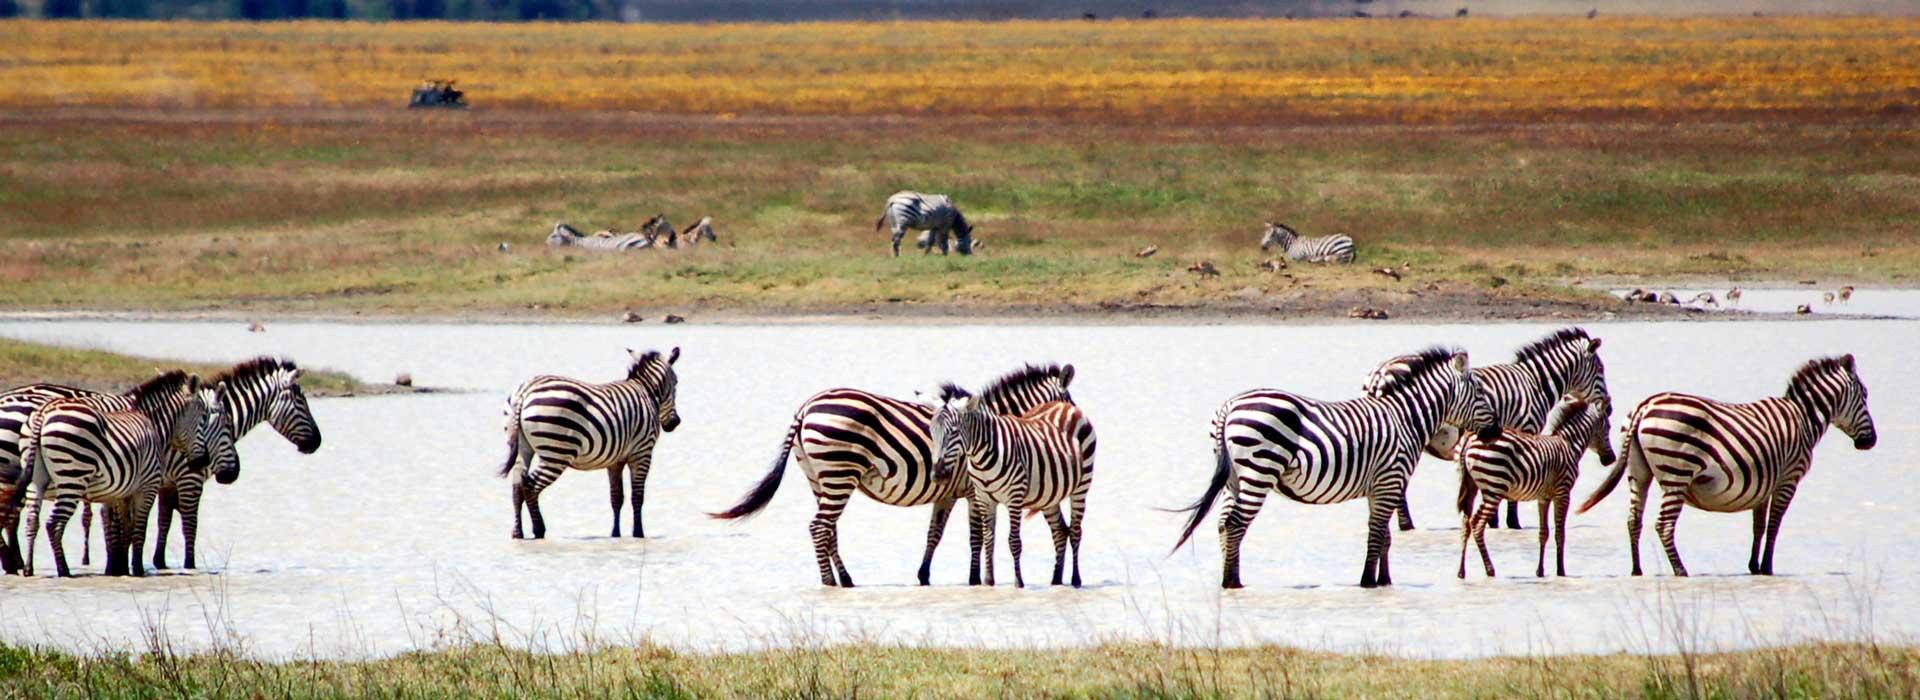 zébres safari tanzanie